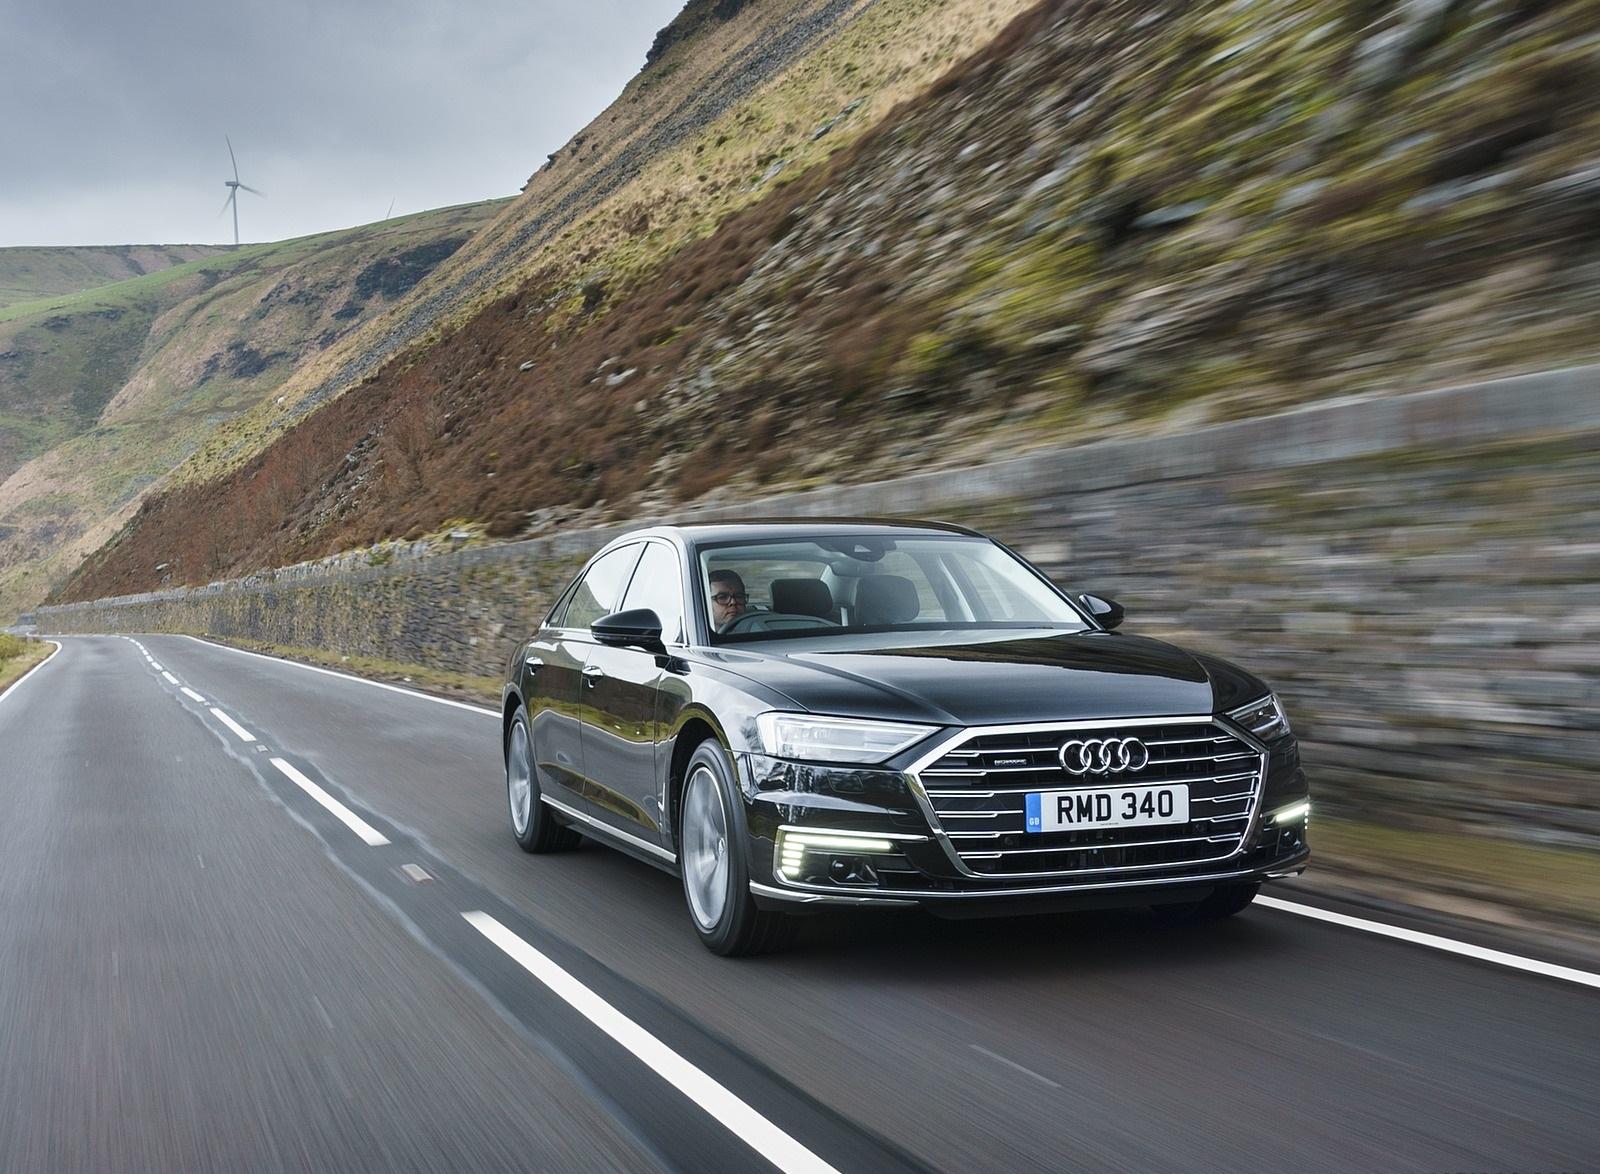 2020 Audi A8 L 60 TFSI e quattro (Plug-In Hybrid UK-Spec) Front Three-Quarter Wallpapers (4)